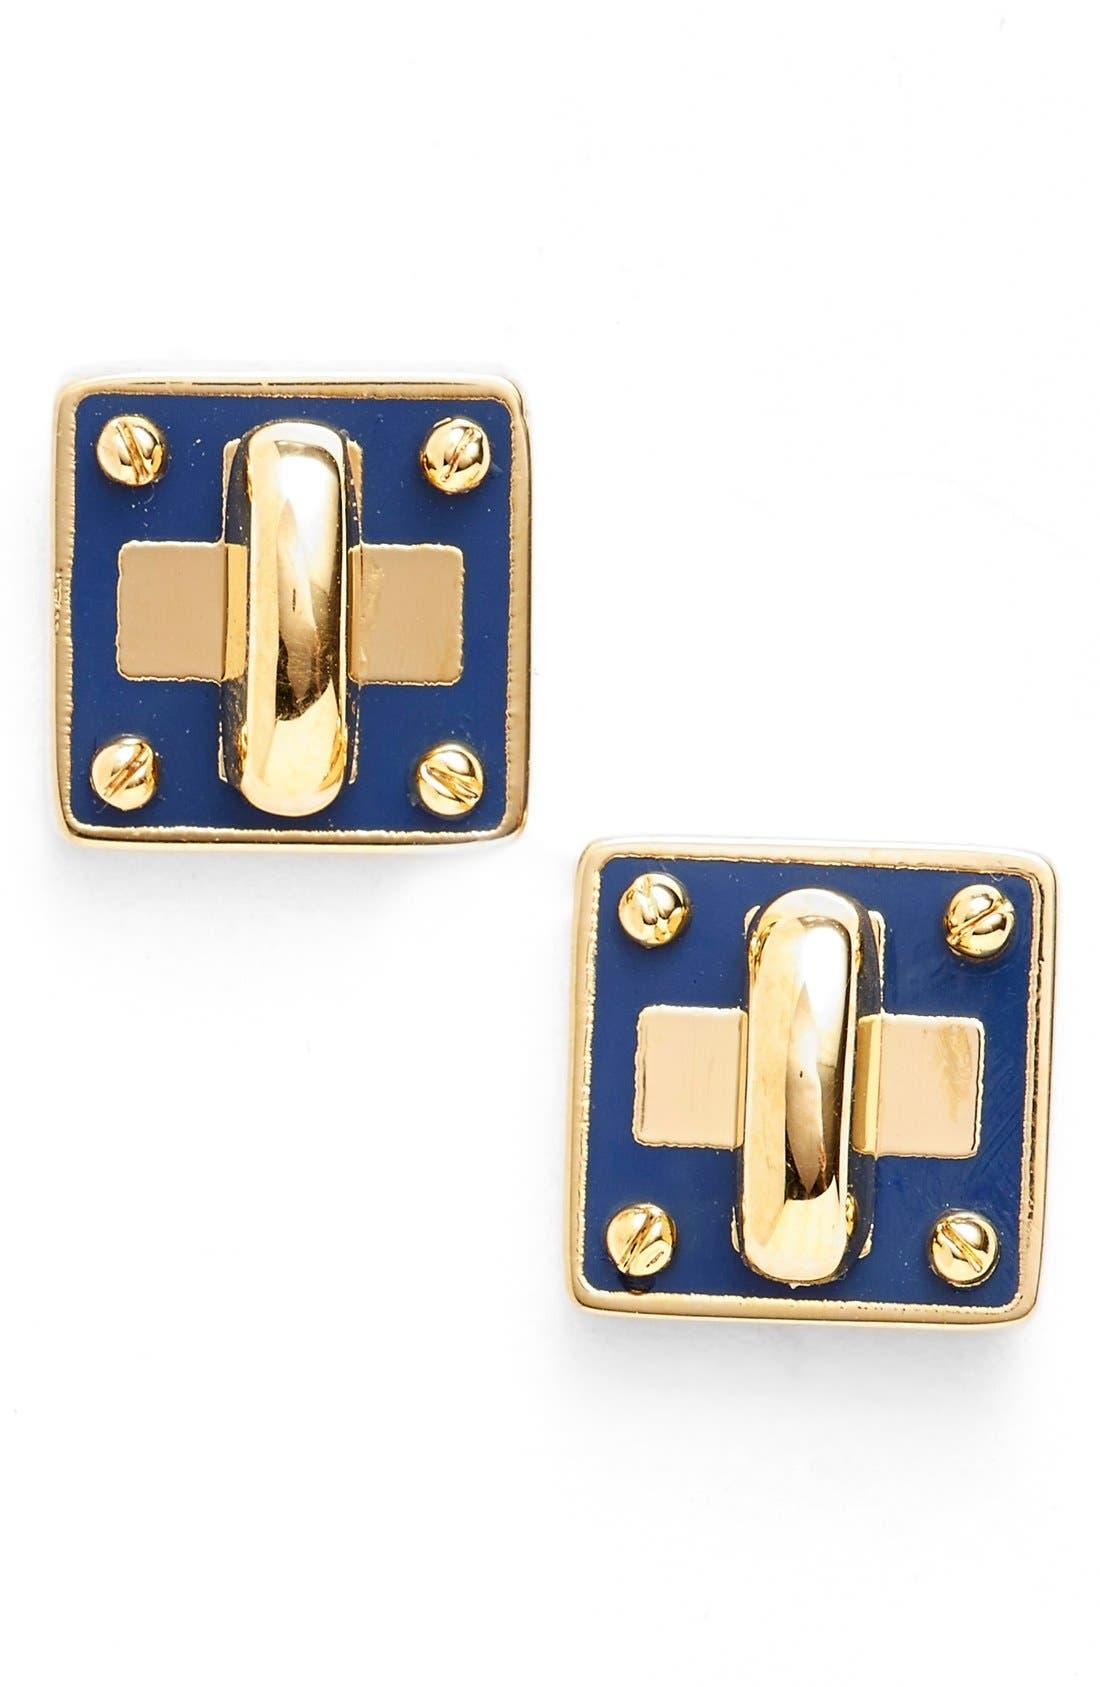 MARC JACOBS MARC BY MARC JACOBS Turnlock EnamelStud Earrings